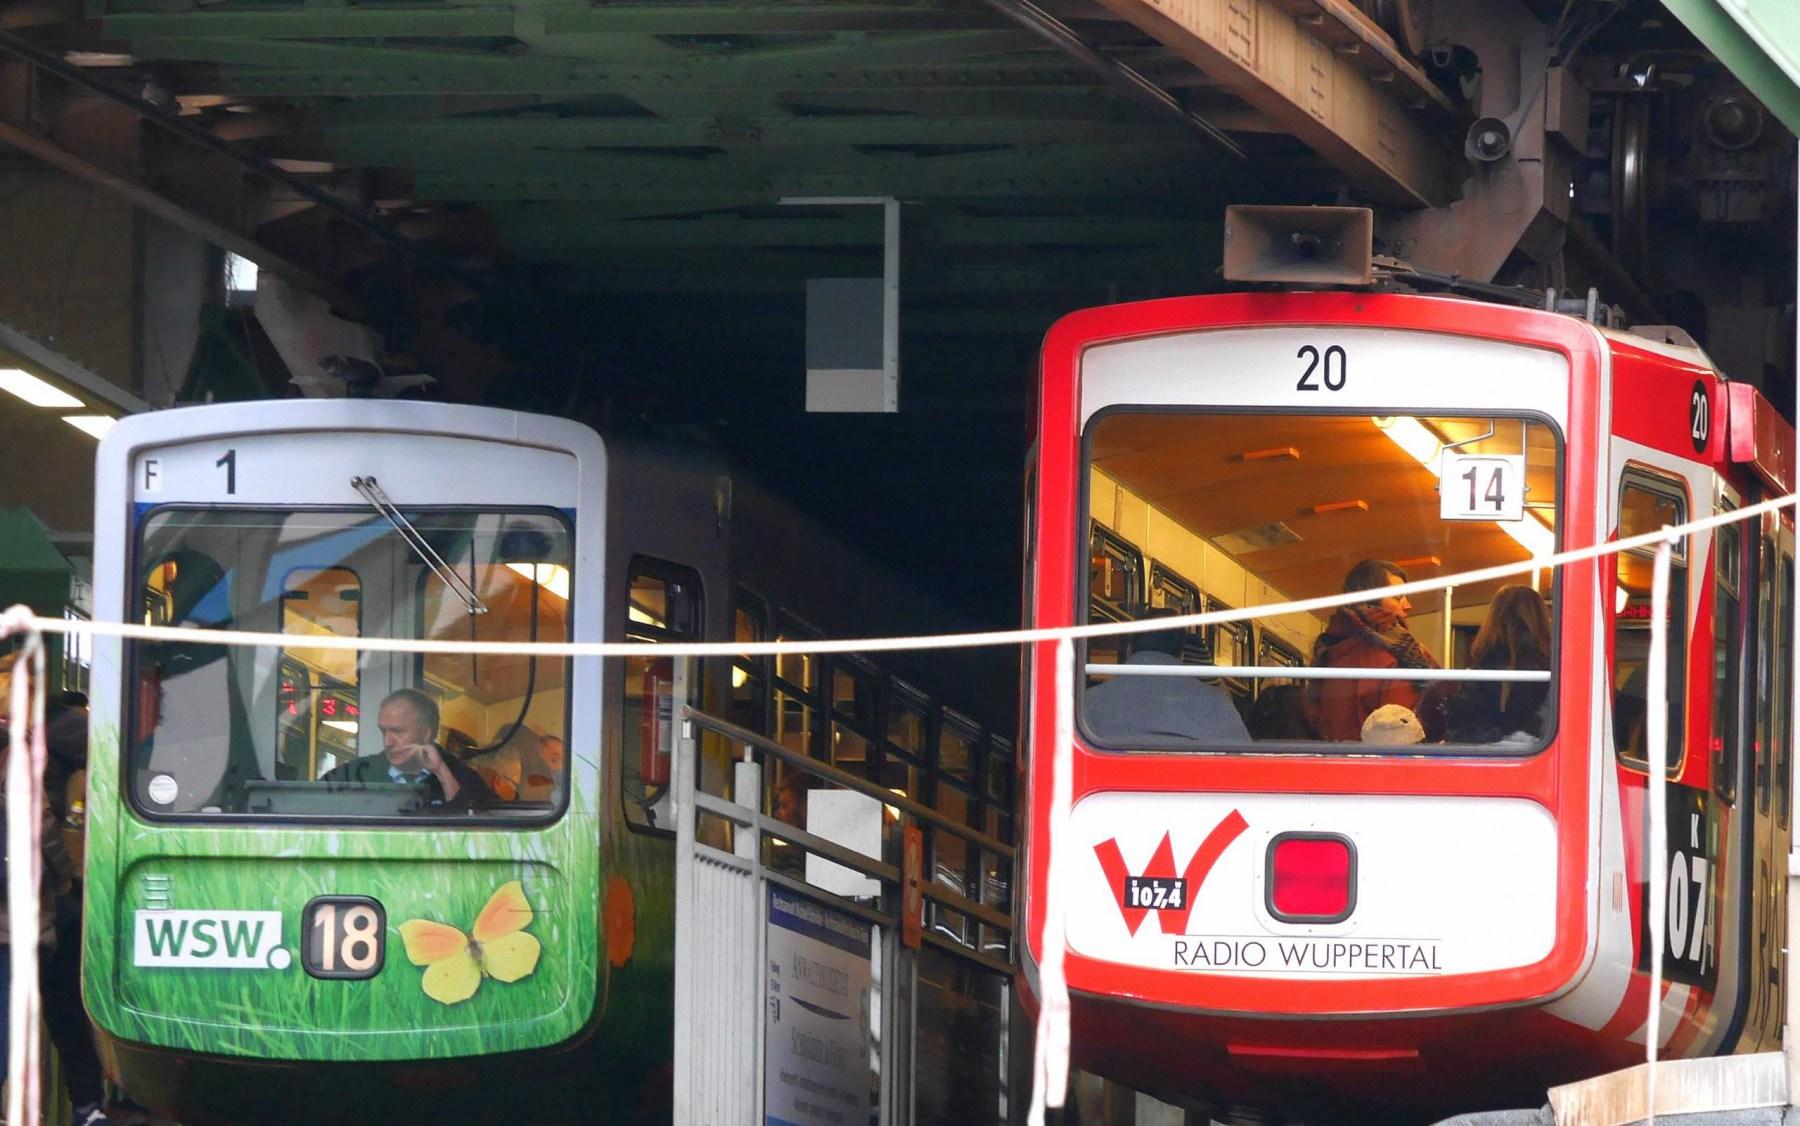 2016-12-17_017_Wuppertal_Umbau-Döppersberg-scaled